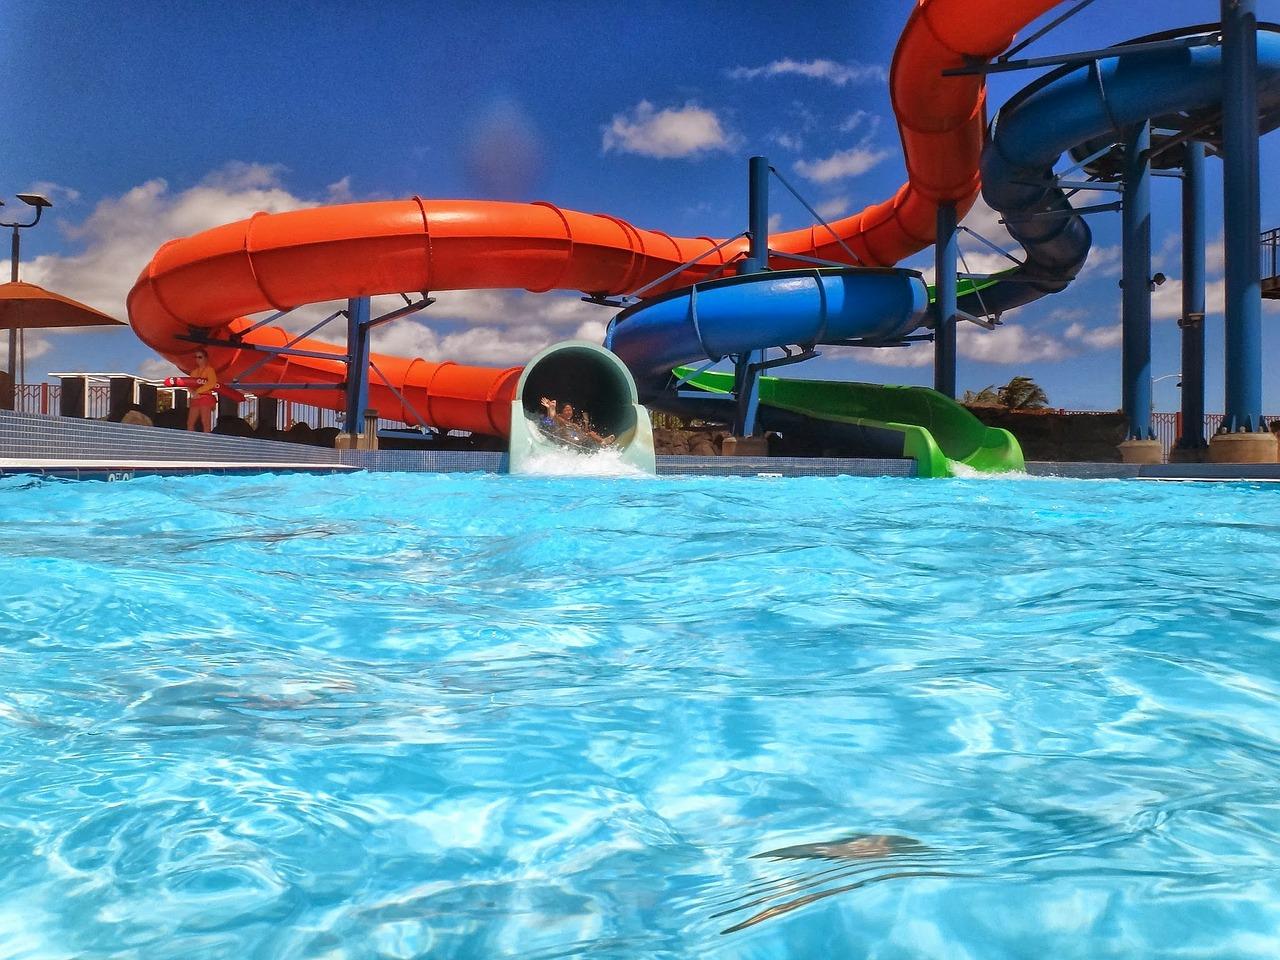 parc aquatique oceanile l'epine